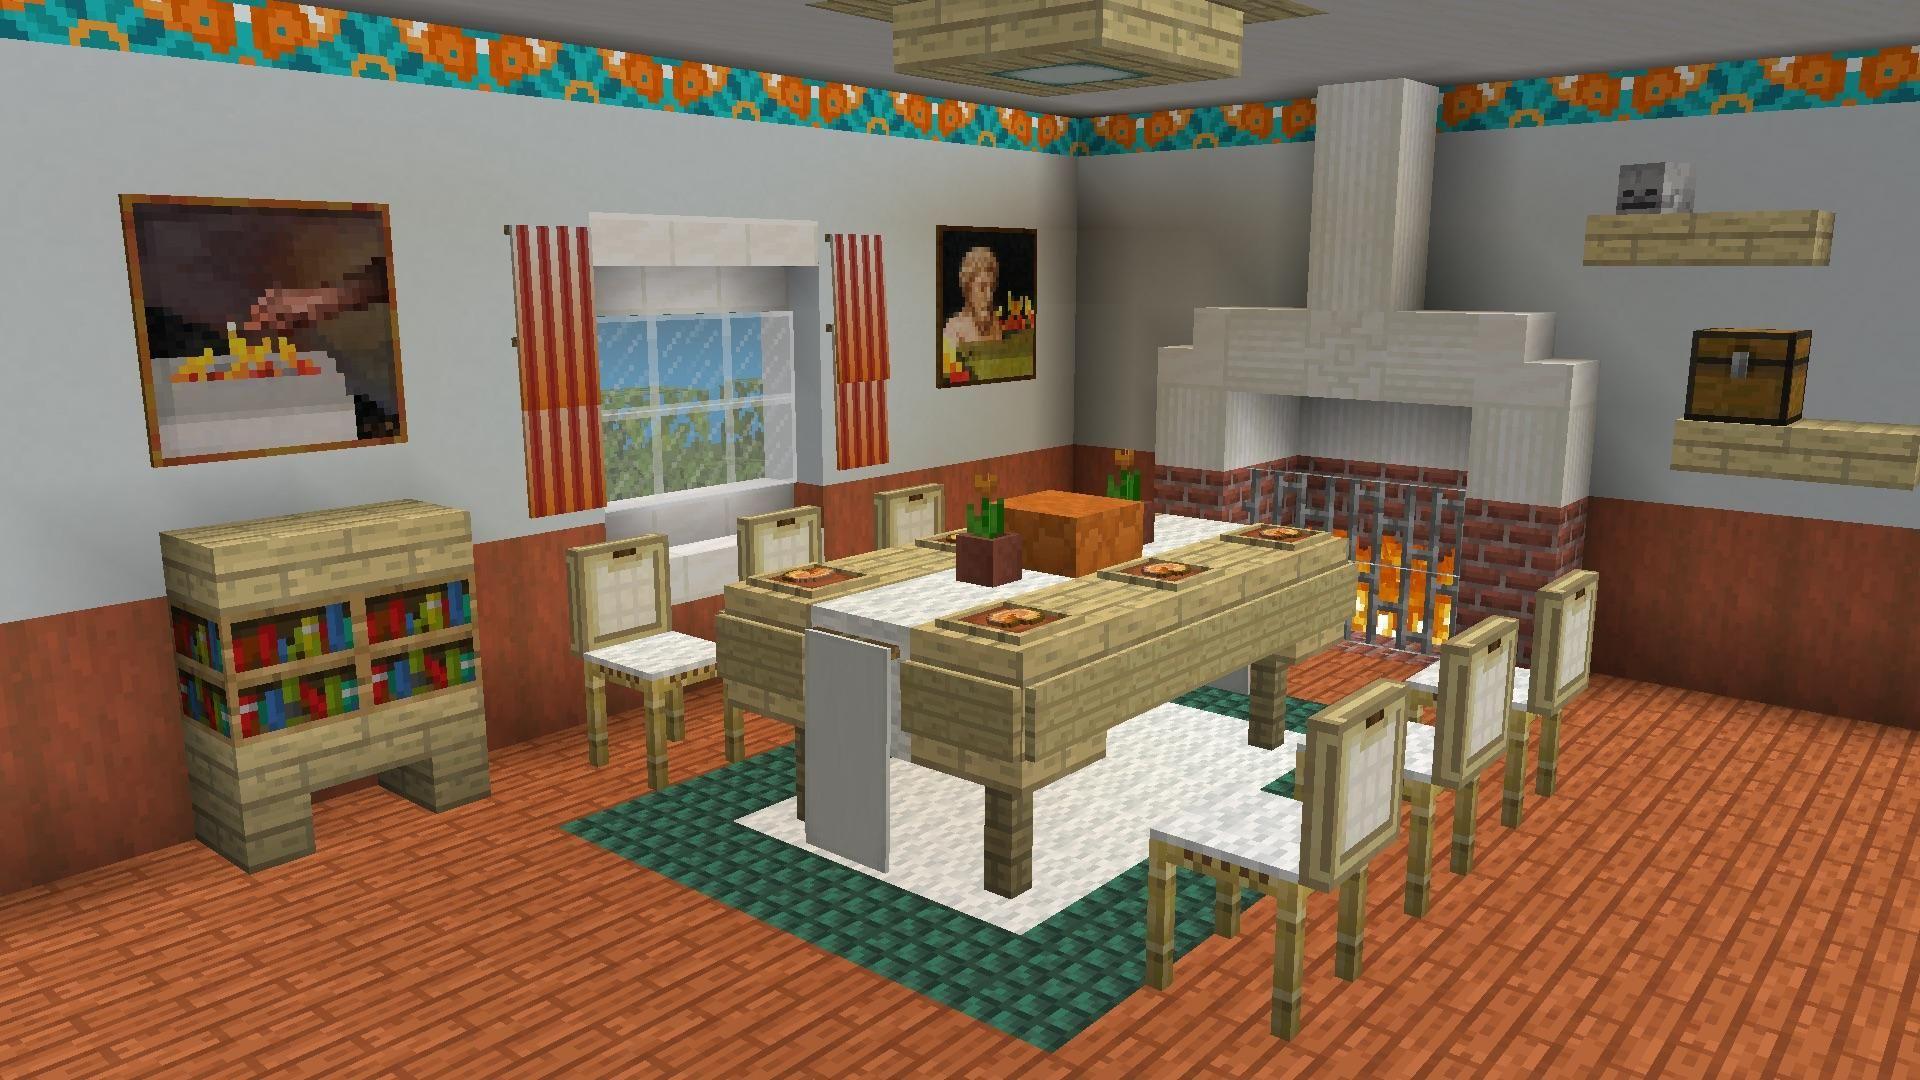 Photo courtesy of ann lowengart photo by: Minecraft decorations, Minecraft room, Minecraft crafts